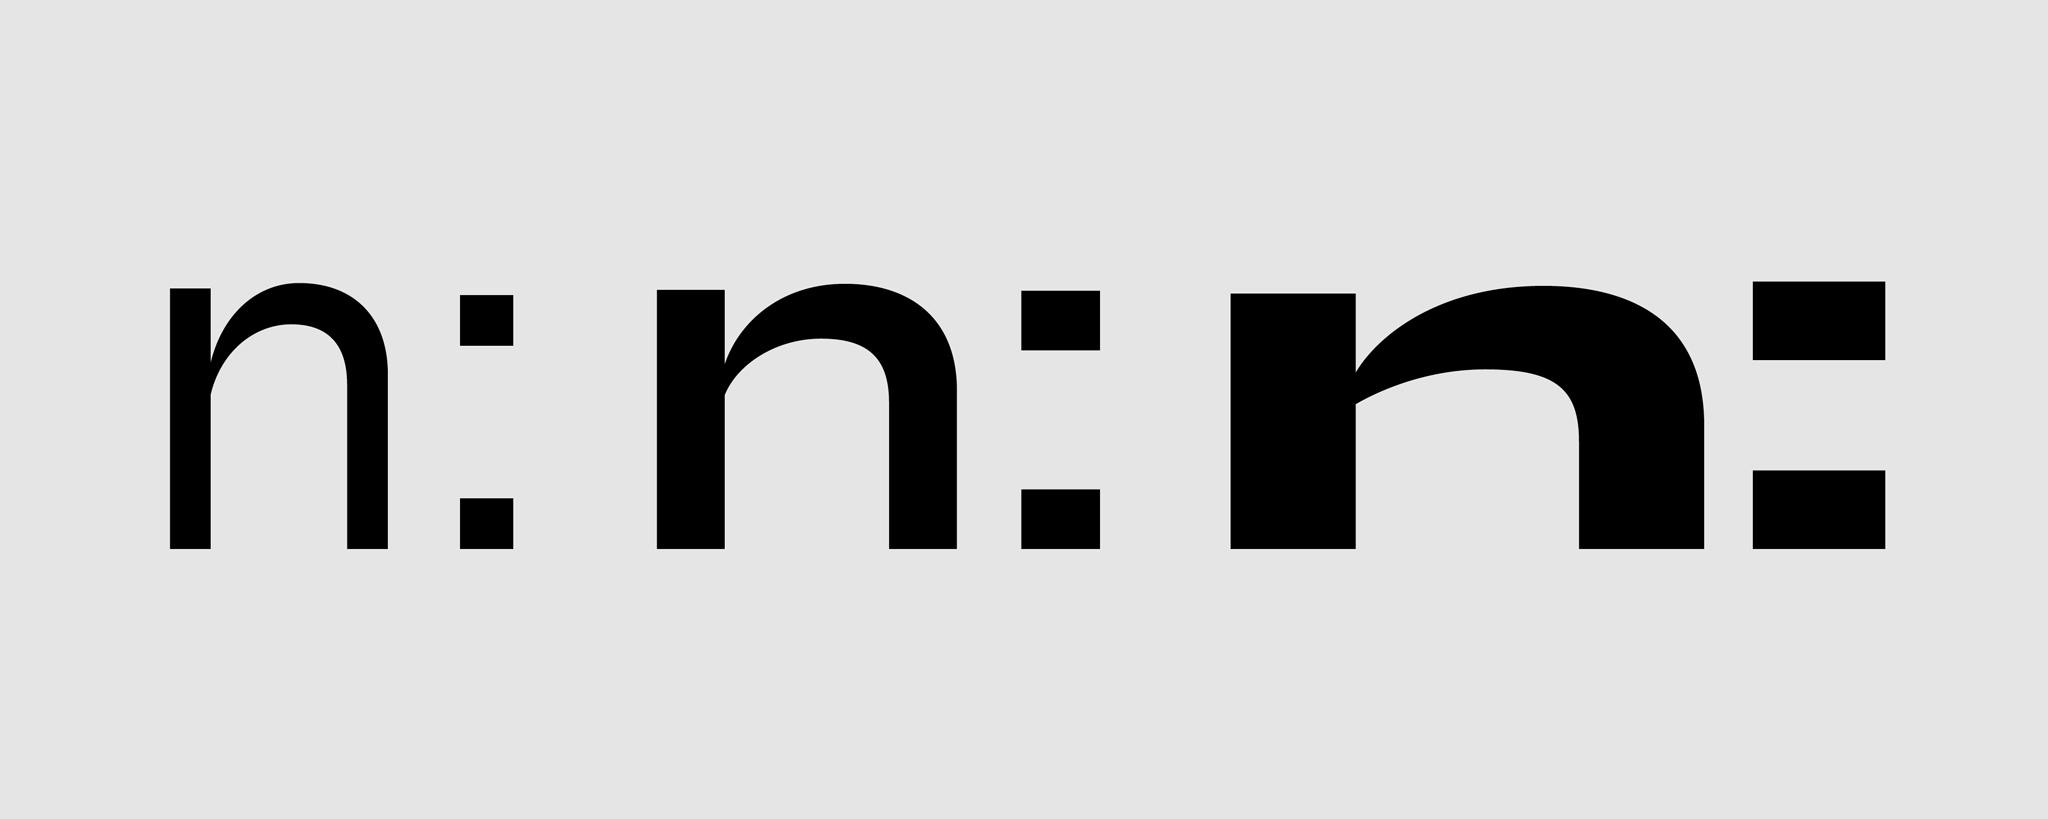 Syne Font Free by Bonjour Monde » Font Squirrel